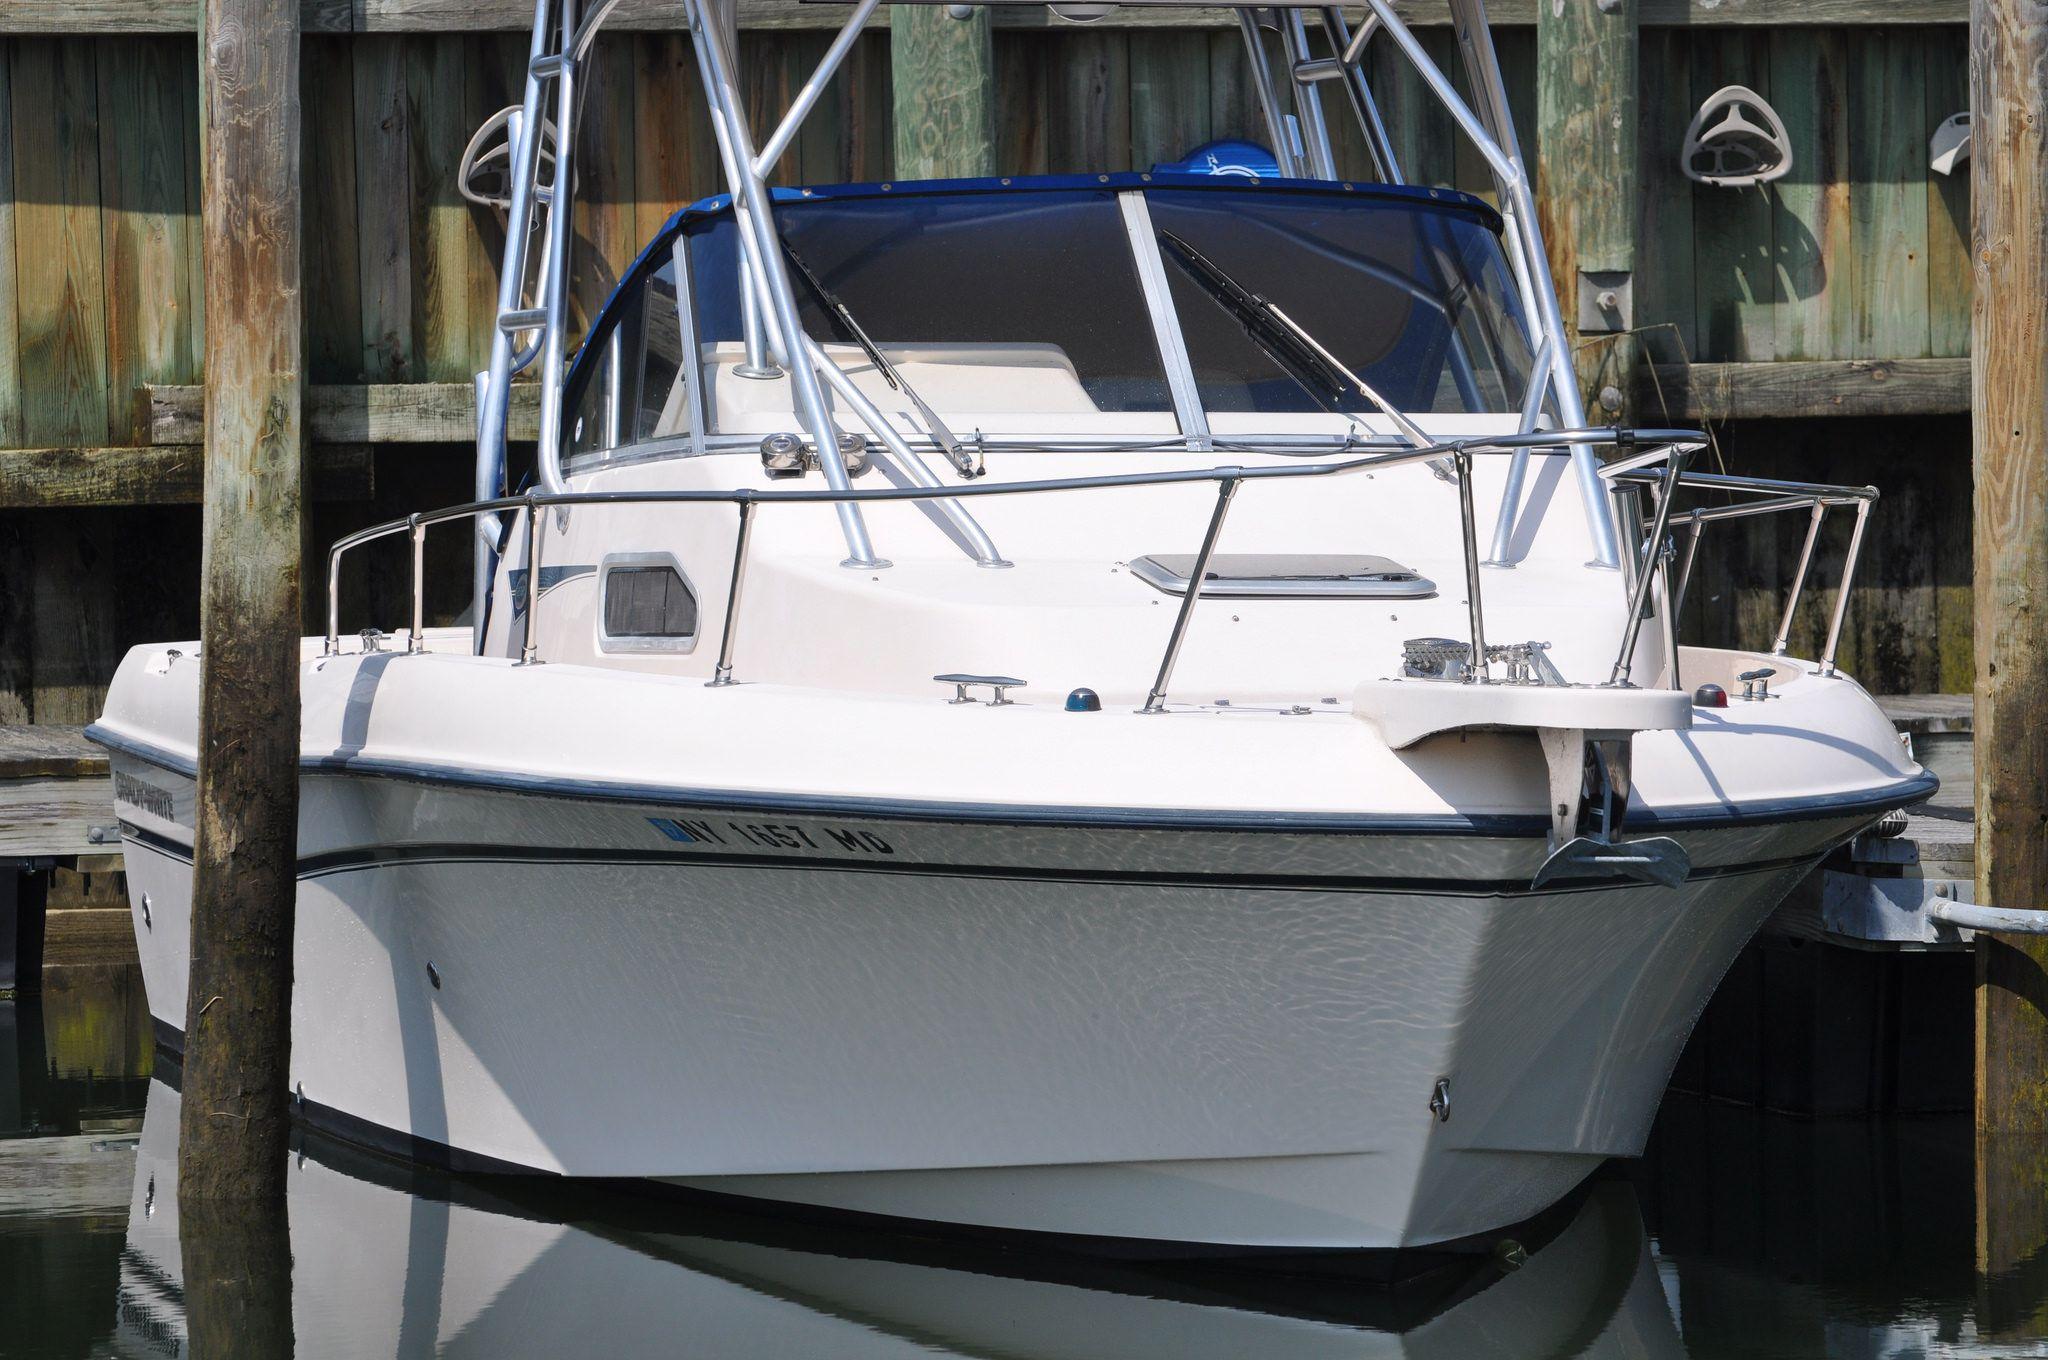 2006 232 Grady White Stuff To Buy Sport Fishing Boats Fishing